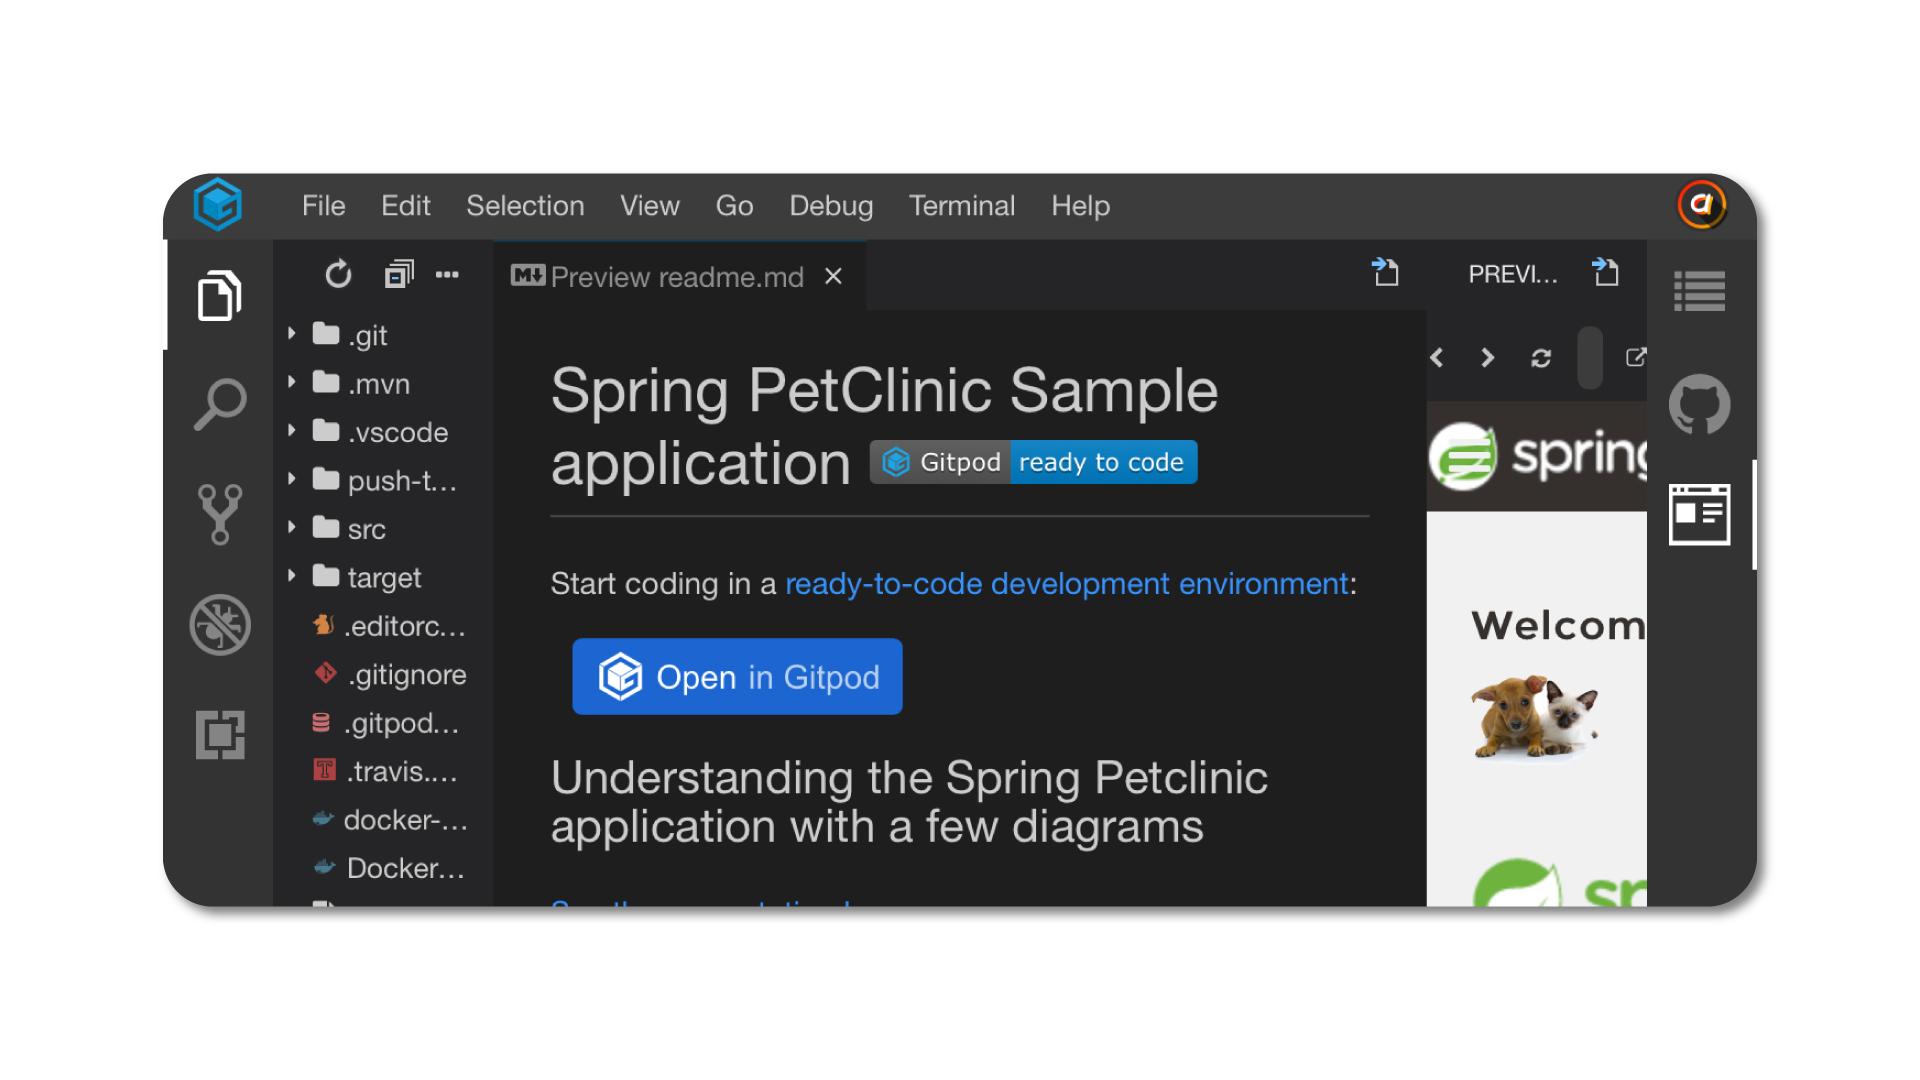 GitPod on mobile Safari in landscape